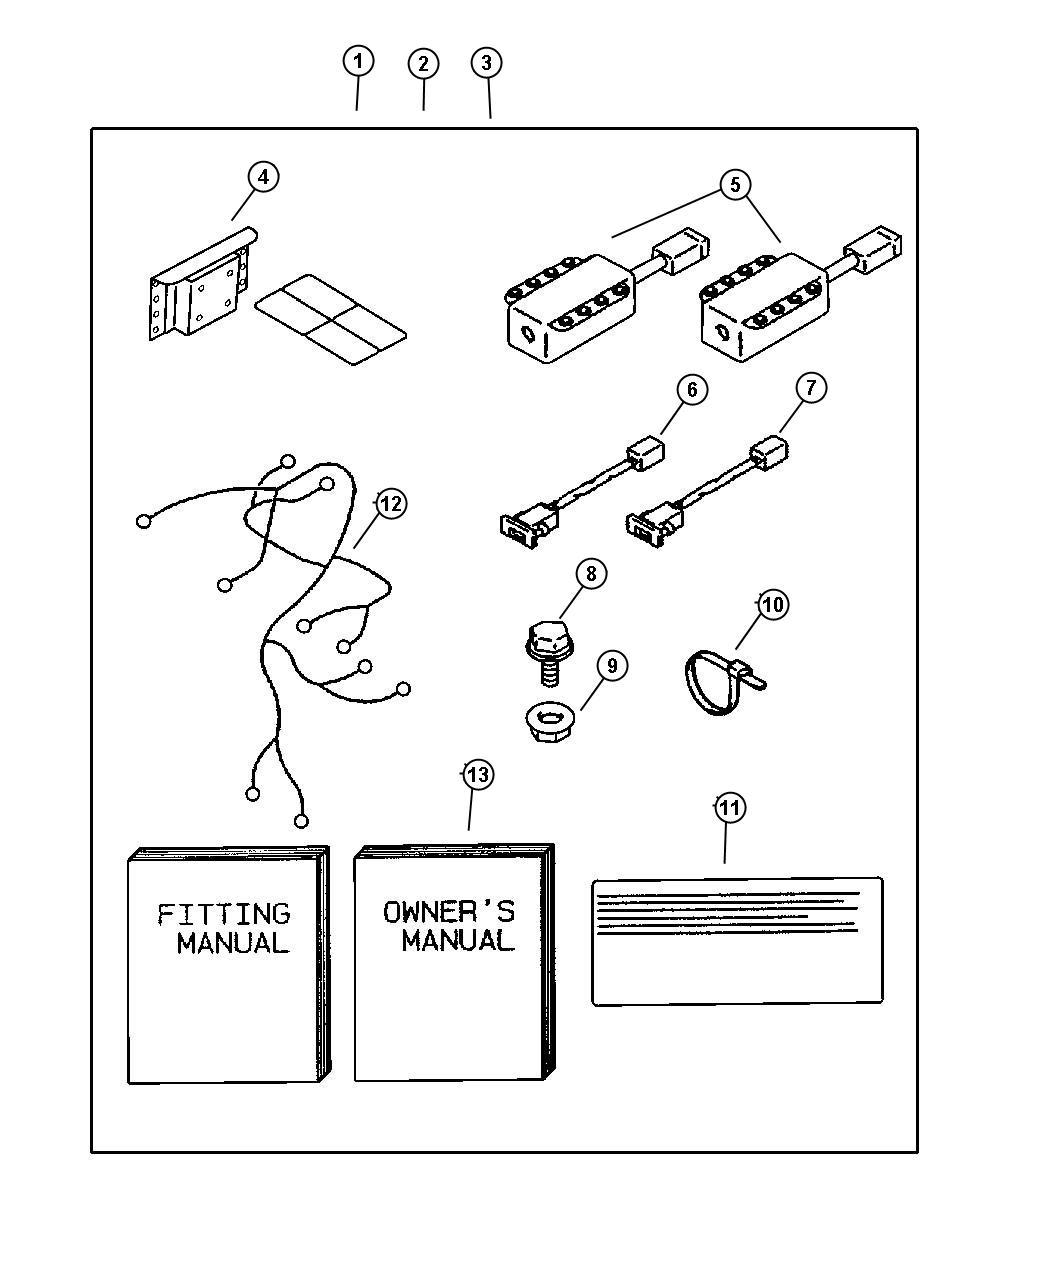 rv fresh water tank sensor wiring diagram 1996 ford bronco radio 2008 caravan fuel parts imageresizertool com